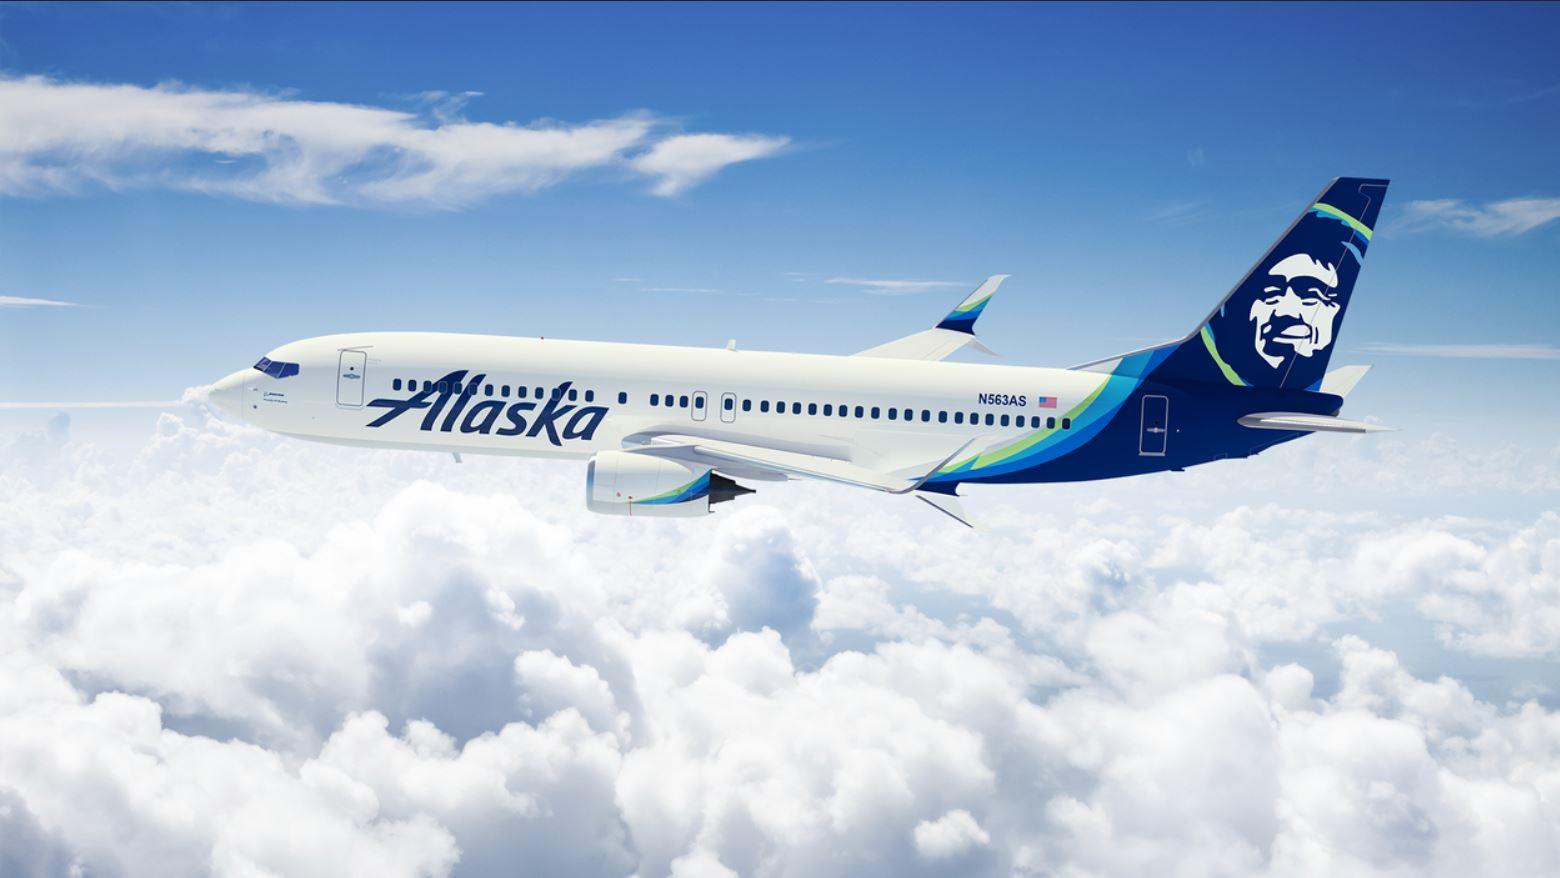 An Alaska Airlines plane in flight.